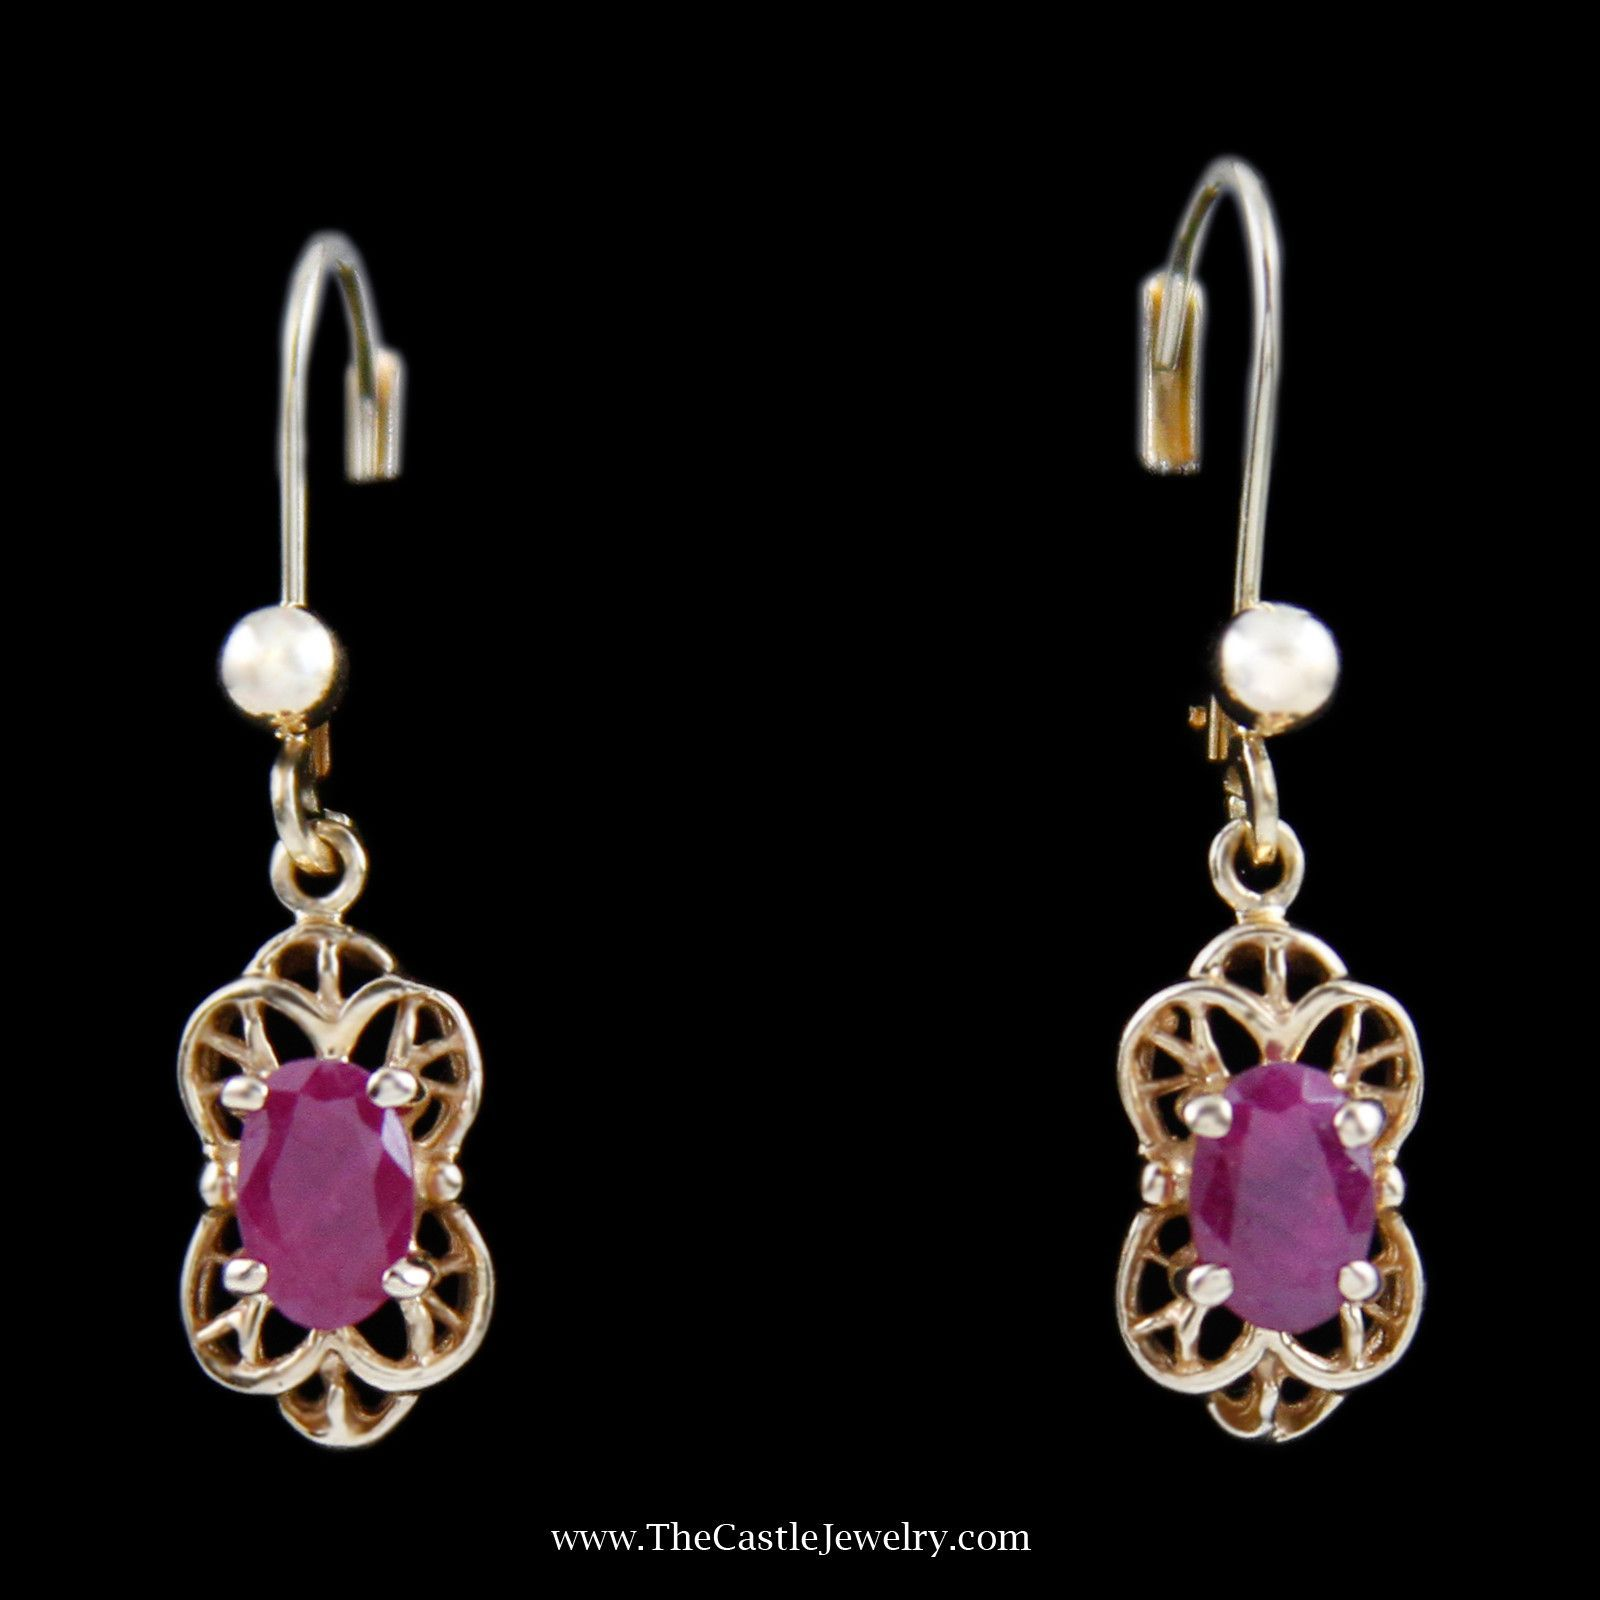 Charming Oval Ruby Earrings w/ Fancy Design Mounting in Yellow Gold